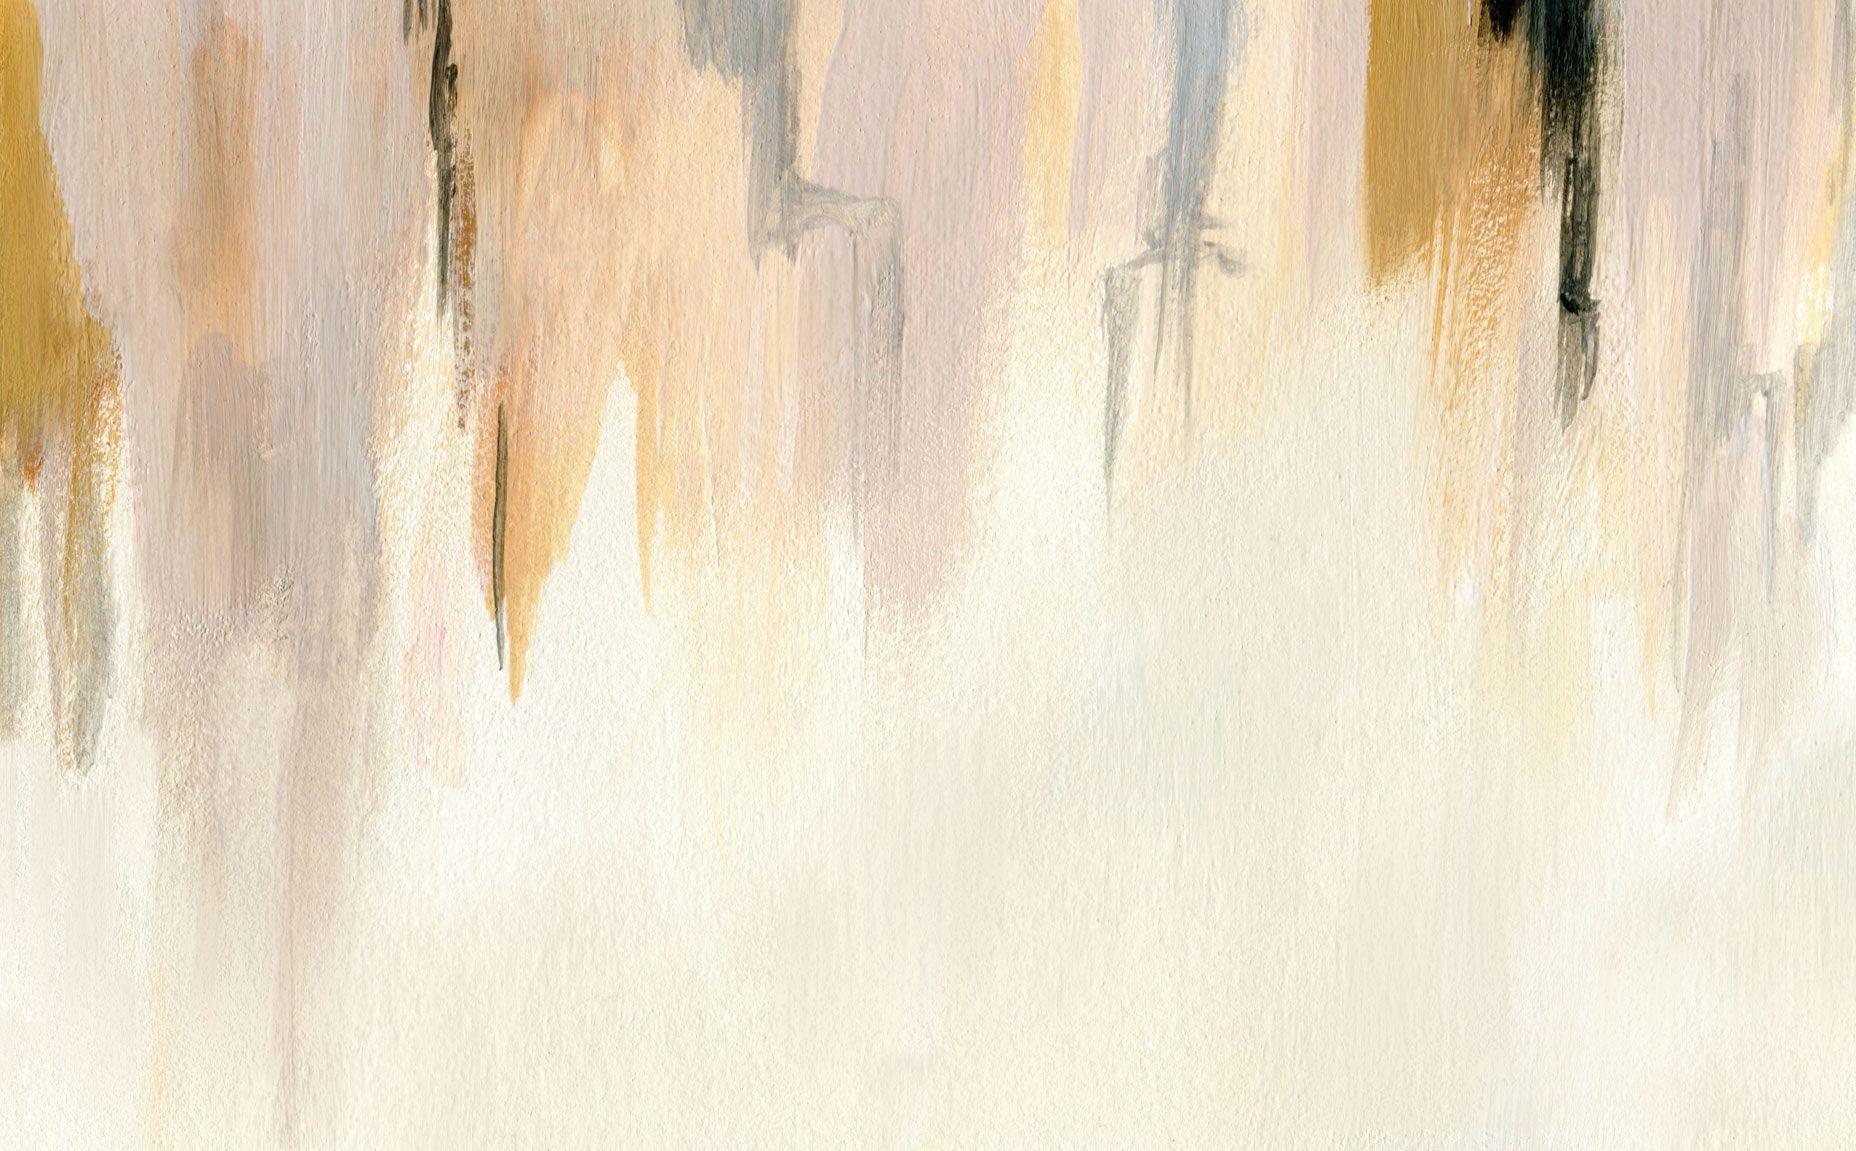 Aesthetic Tan Laptop Wallpapers - Wallpaper Cave